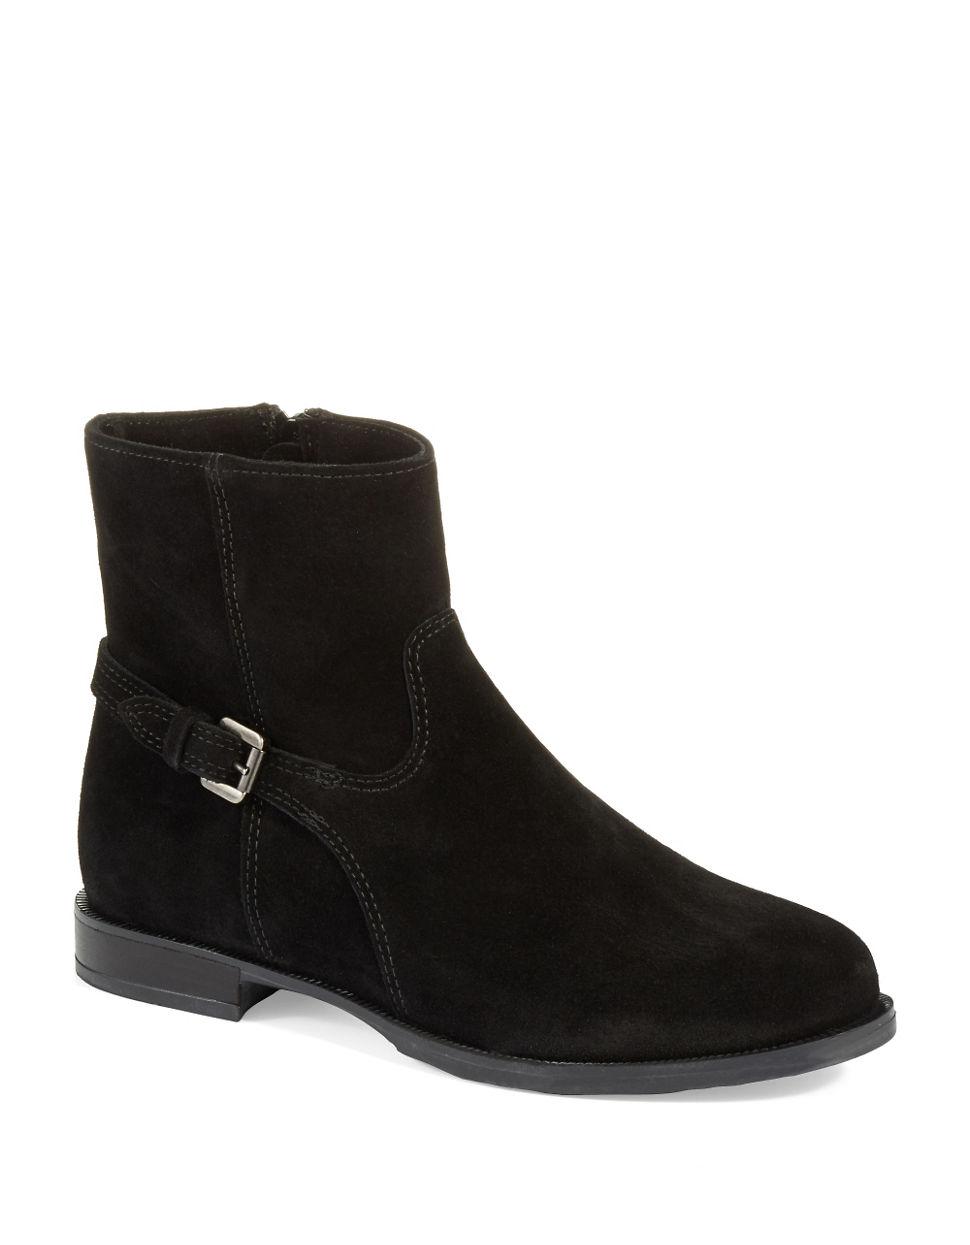 La Canadienne Denim Lara Waterproof Ankle Boots In Black